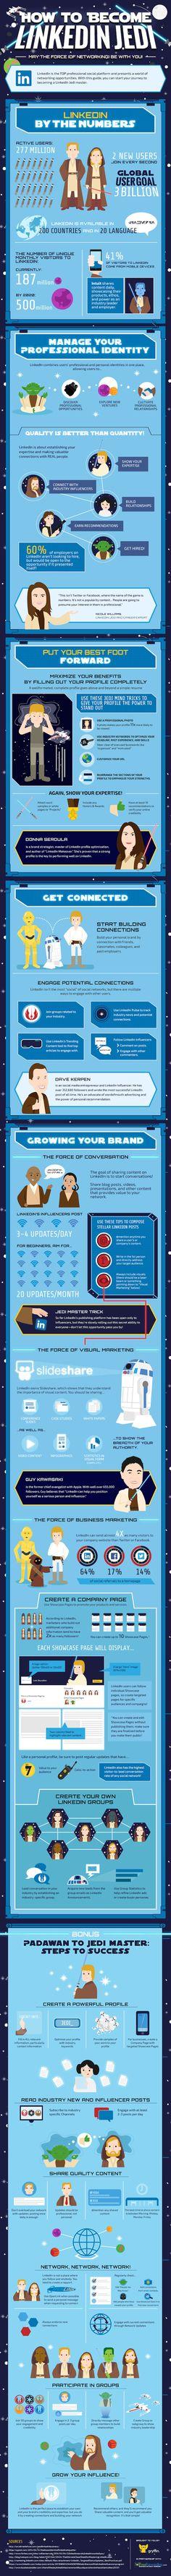 Become a LinkedIn Jedi {Infigraphic}